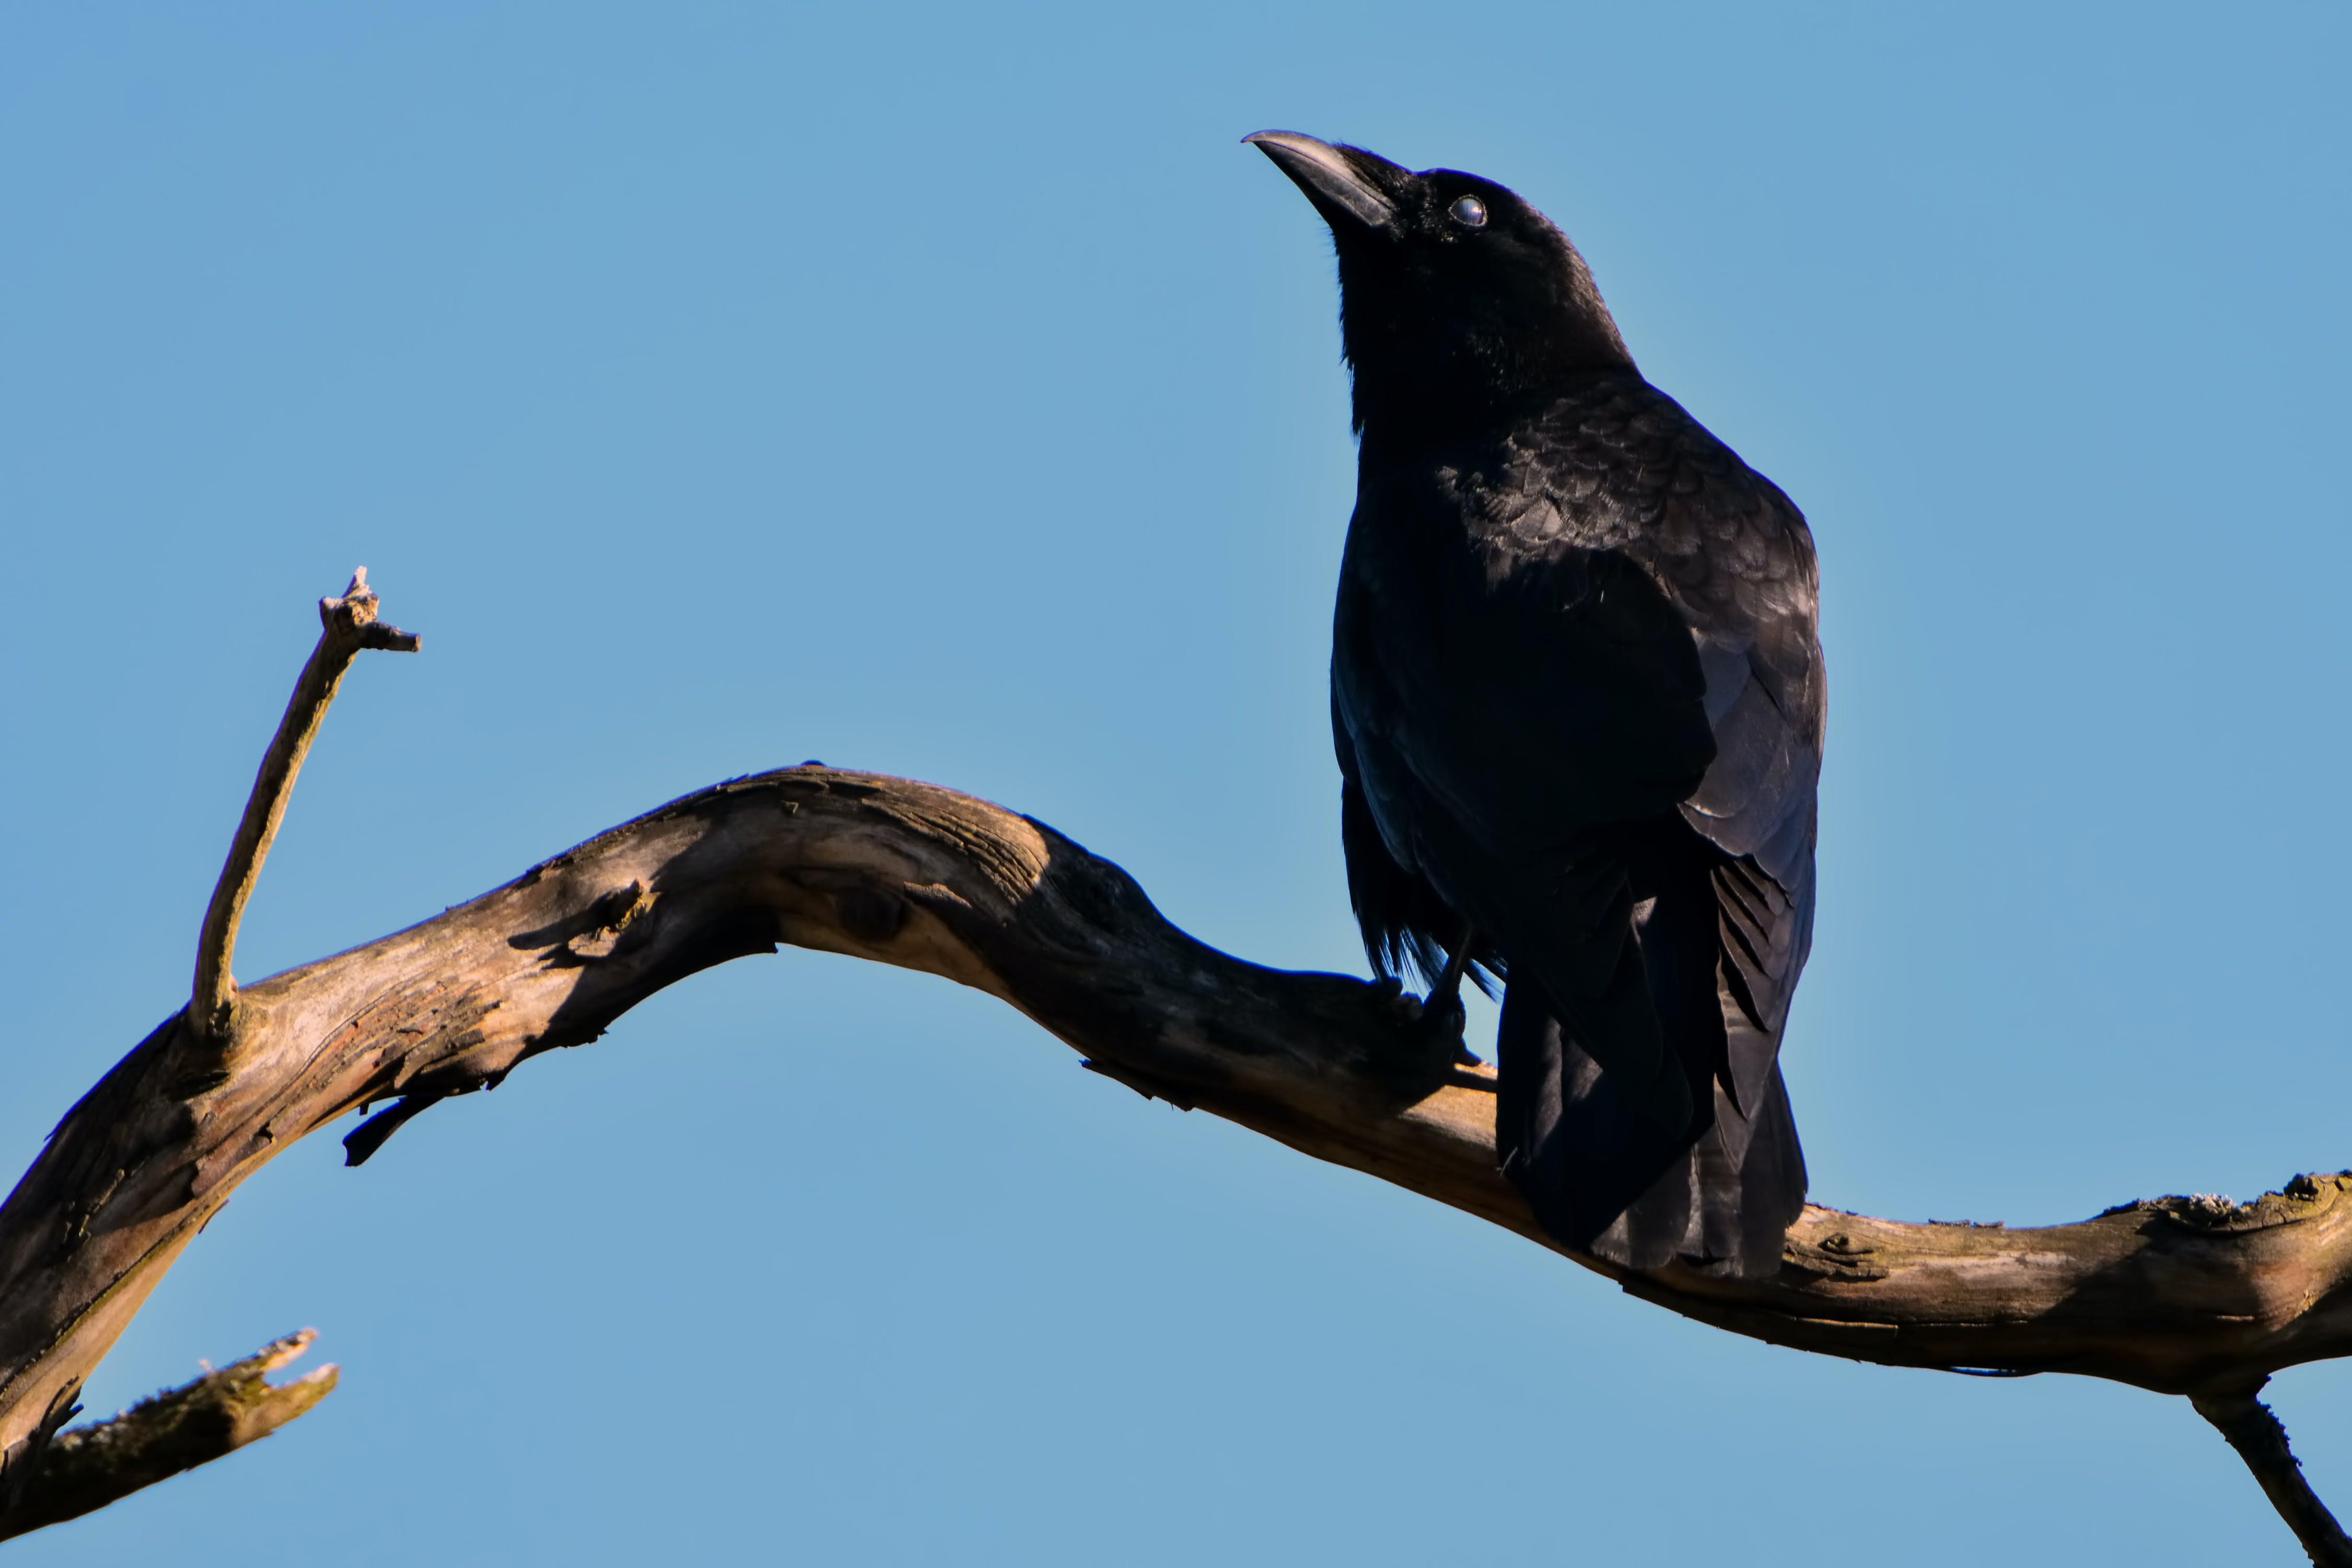 Black Bird on Top of Brown Driftwood